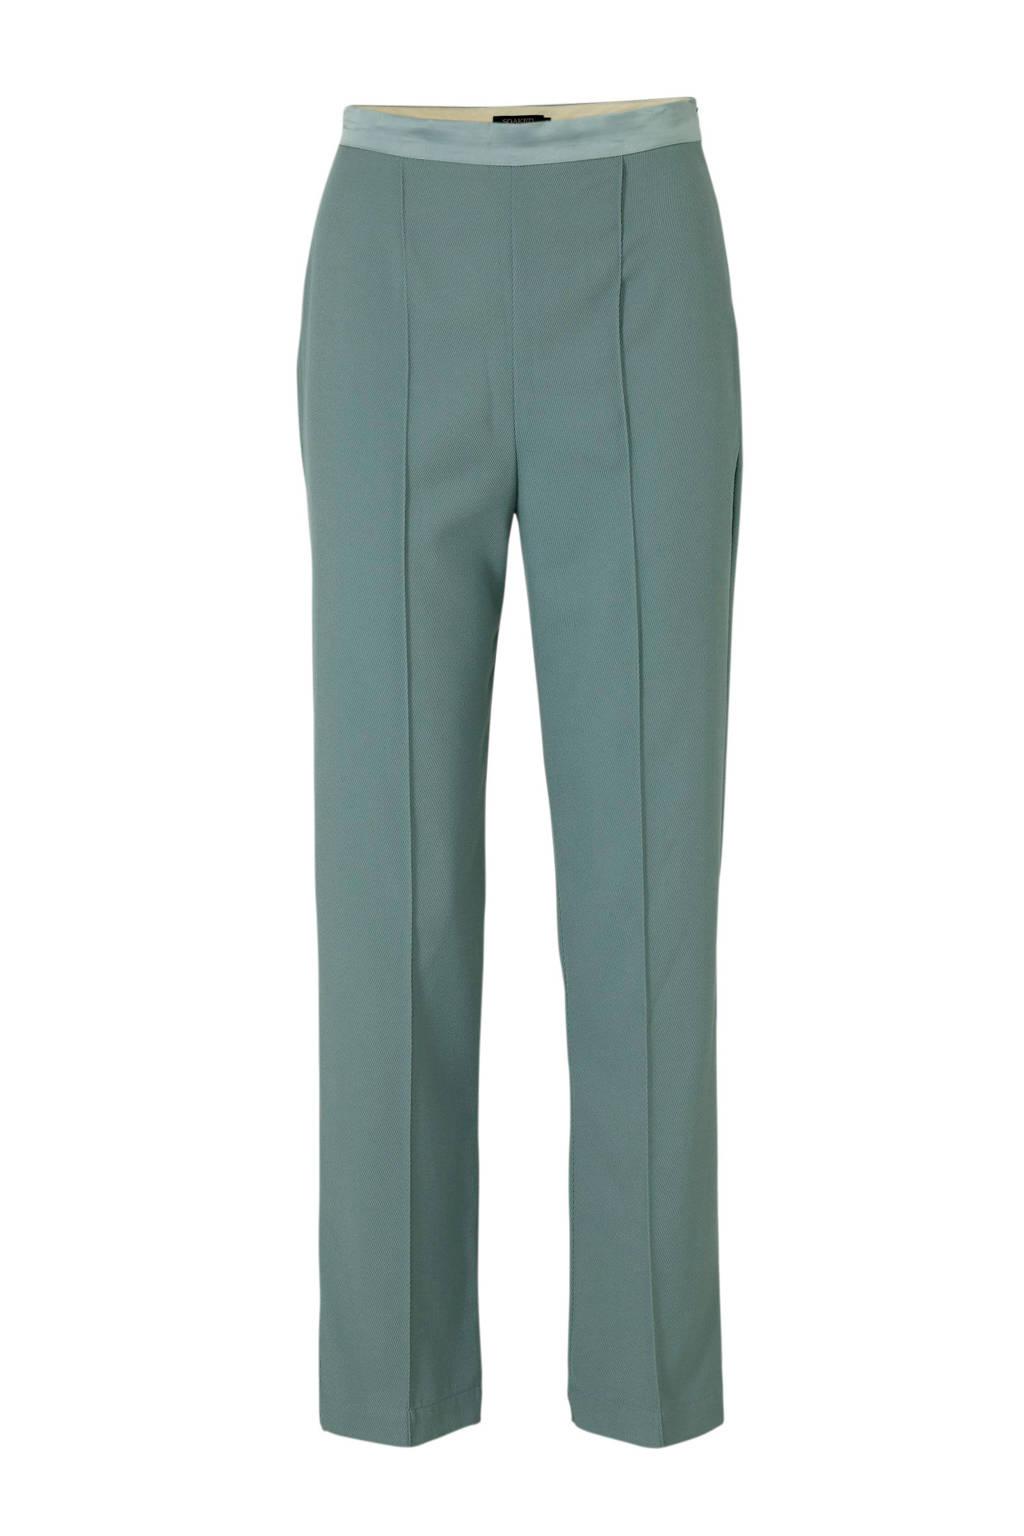 Soaked In Luxury high waist straight fit broek Beatrix groen, Groen